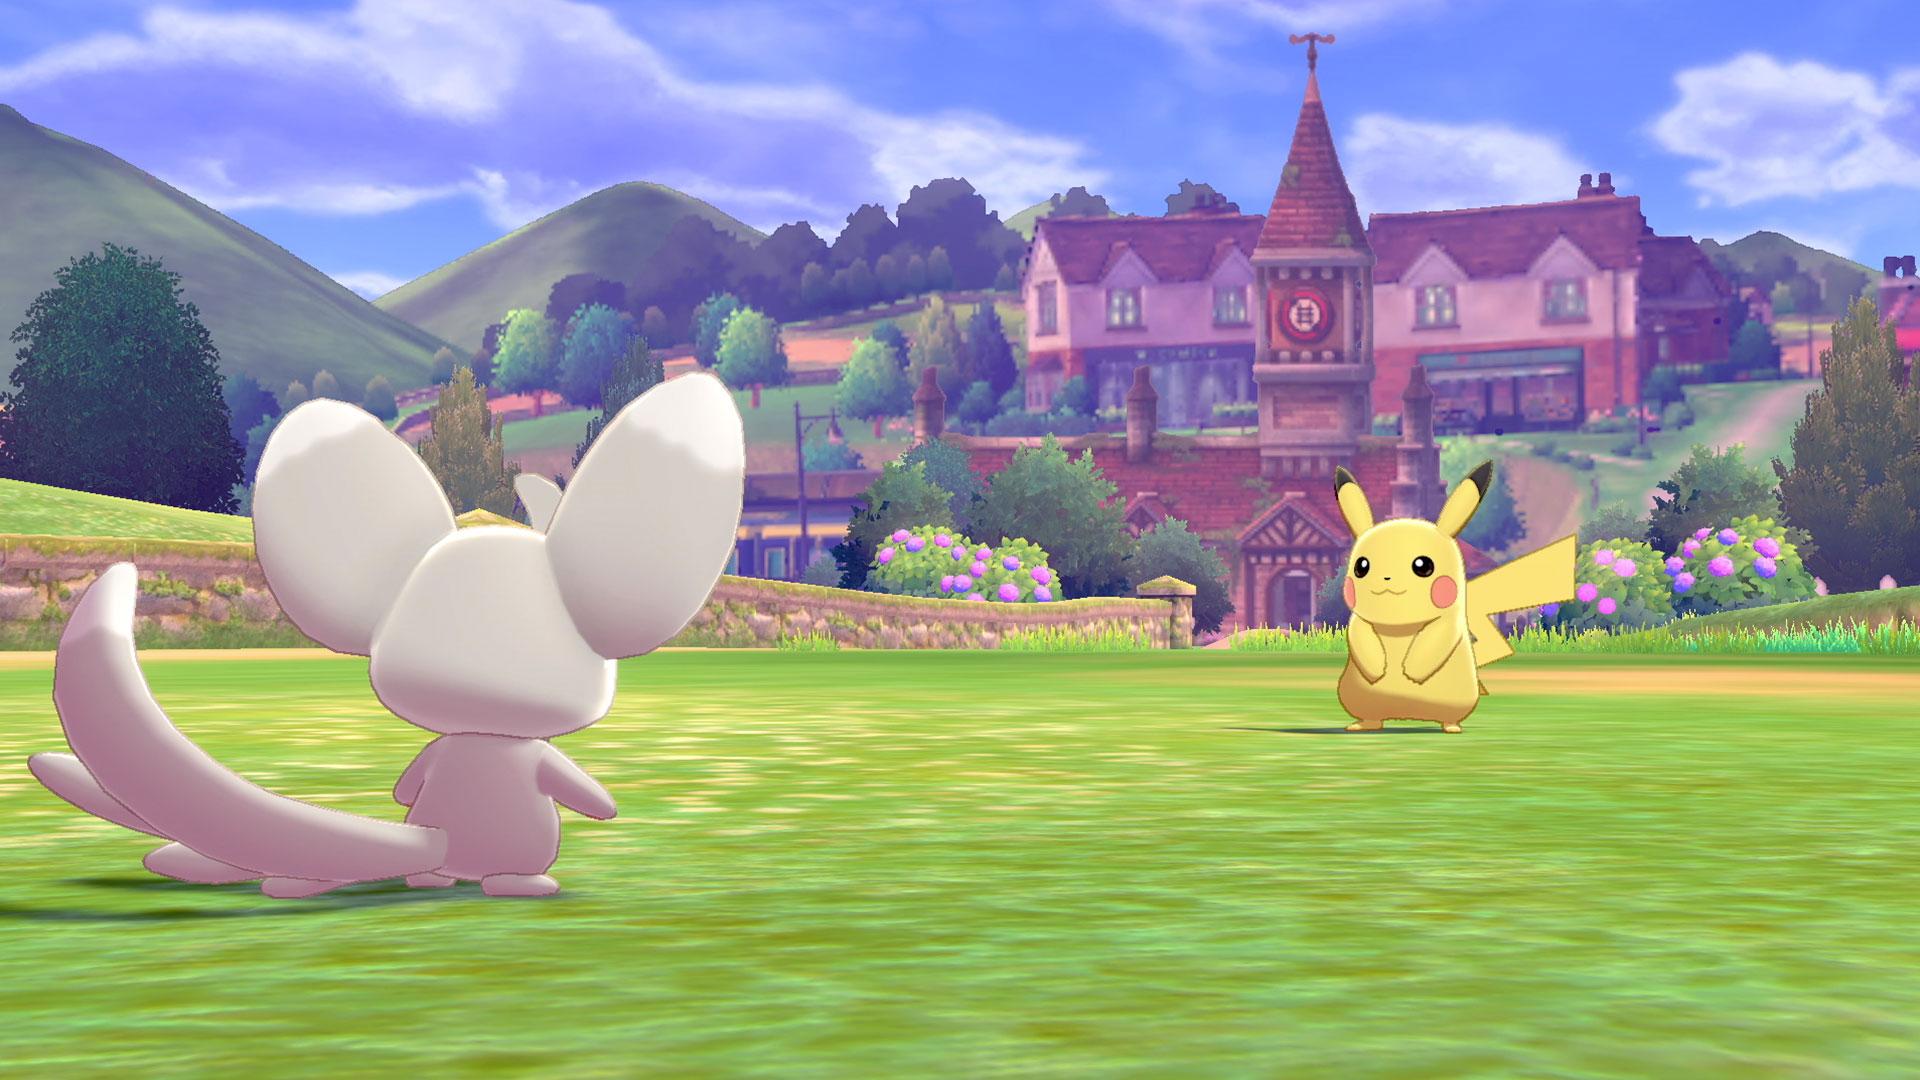 Pokemon Sword And Shield Pokedex All Pokemon In The New Pokemon